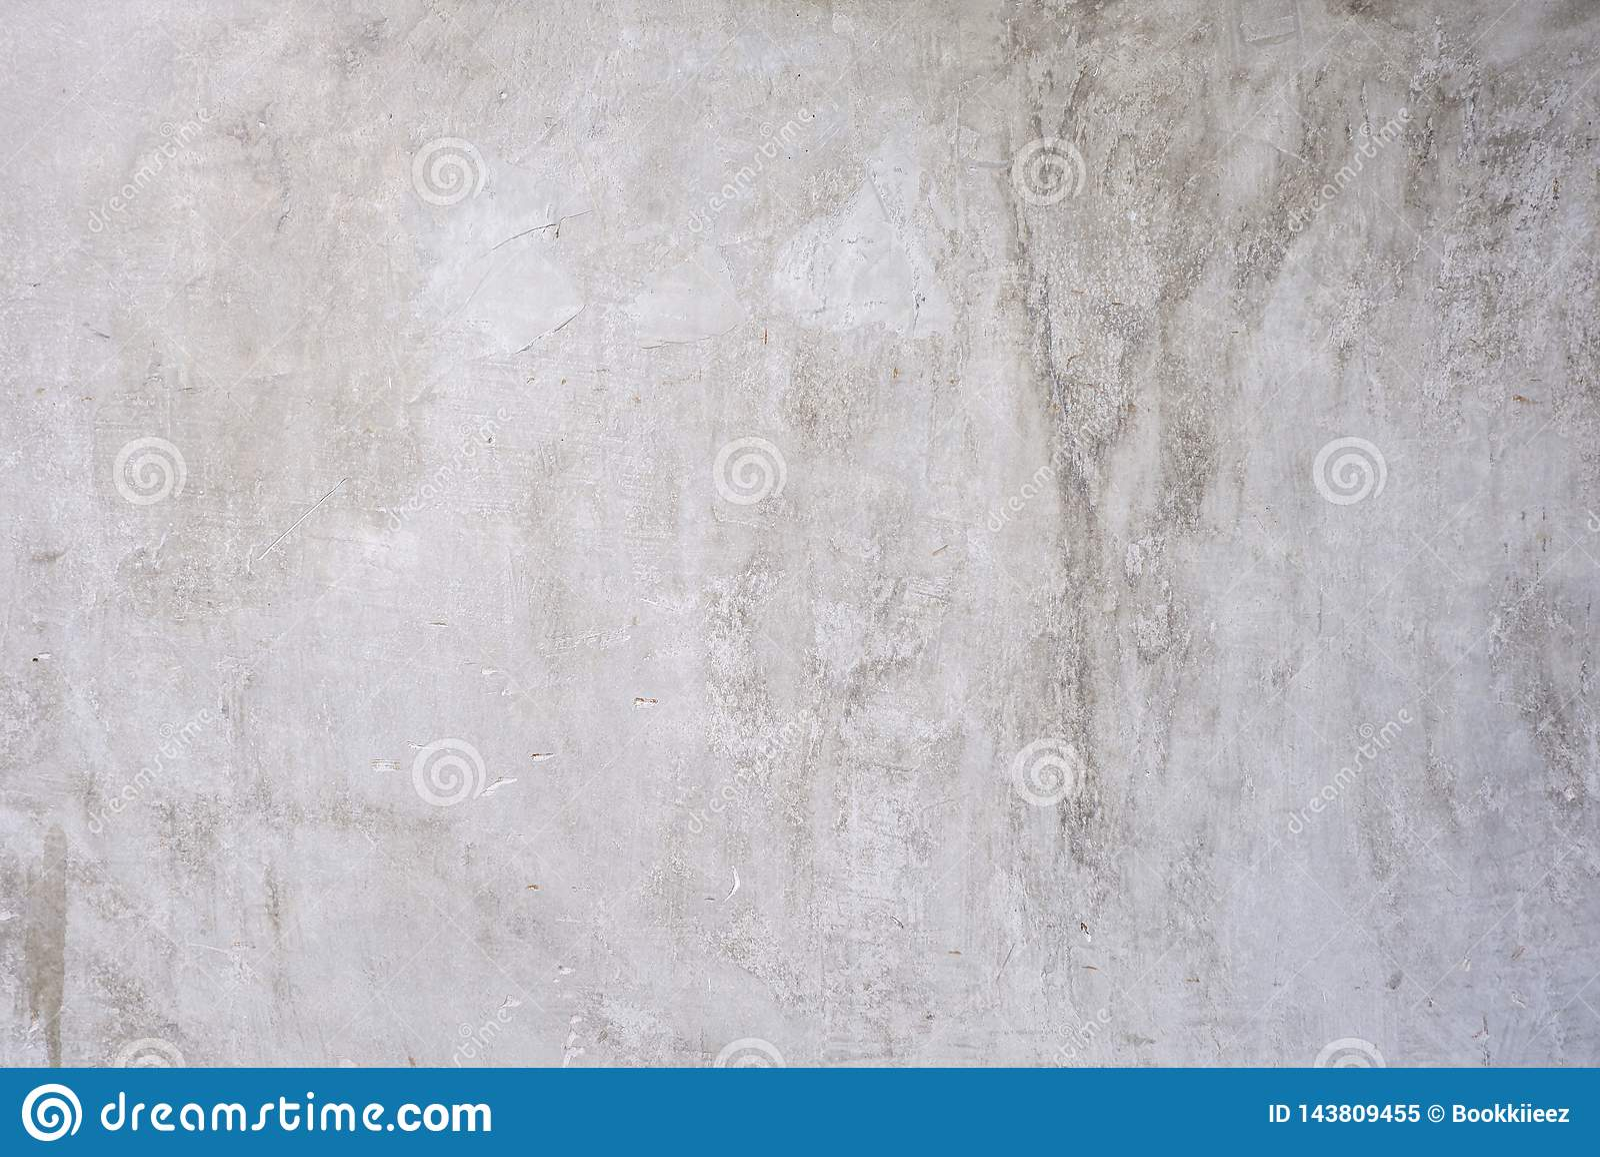 Старая и грязная предпосылка текстуры стены цемента